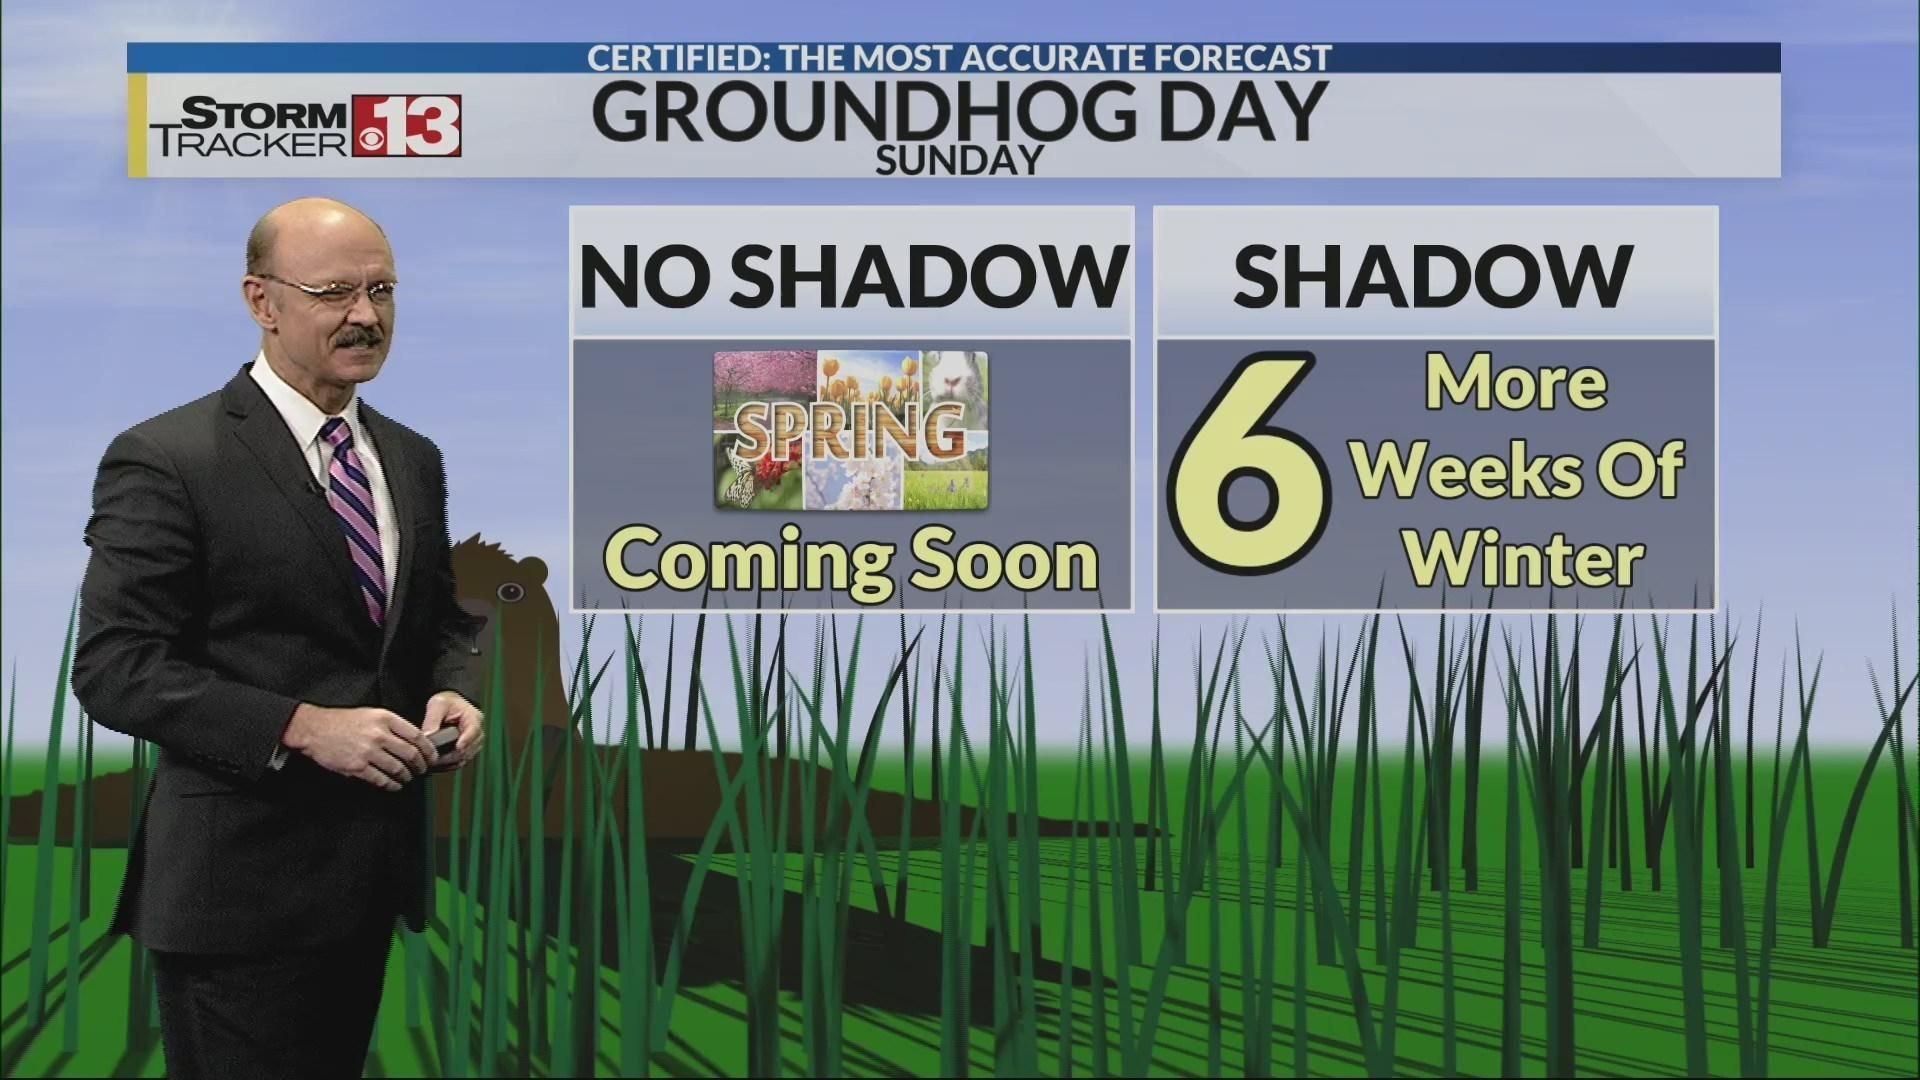 Groundhog Day 2020 Fun folklore WOWK 13 News 1920x1080